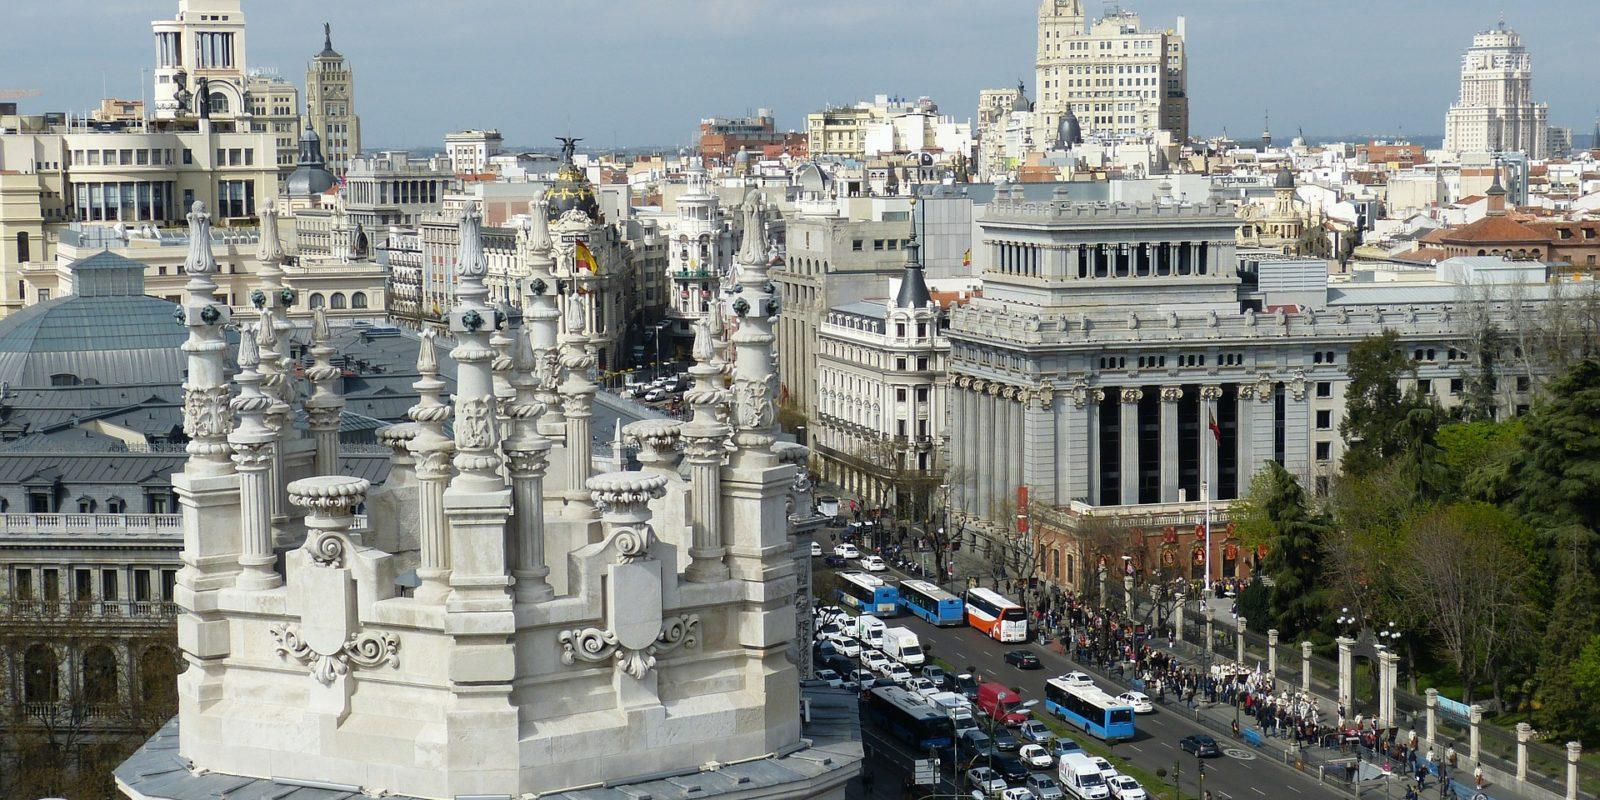 Madrid City Architecture, Spain